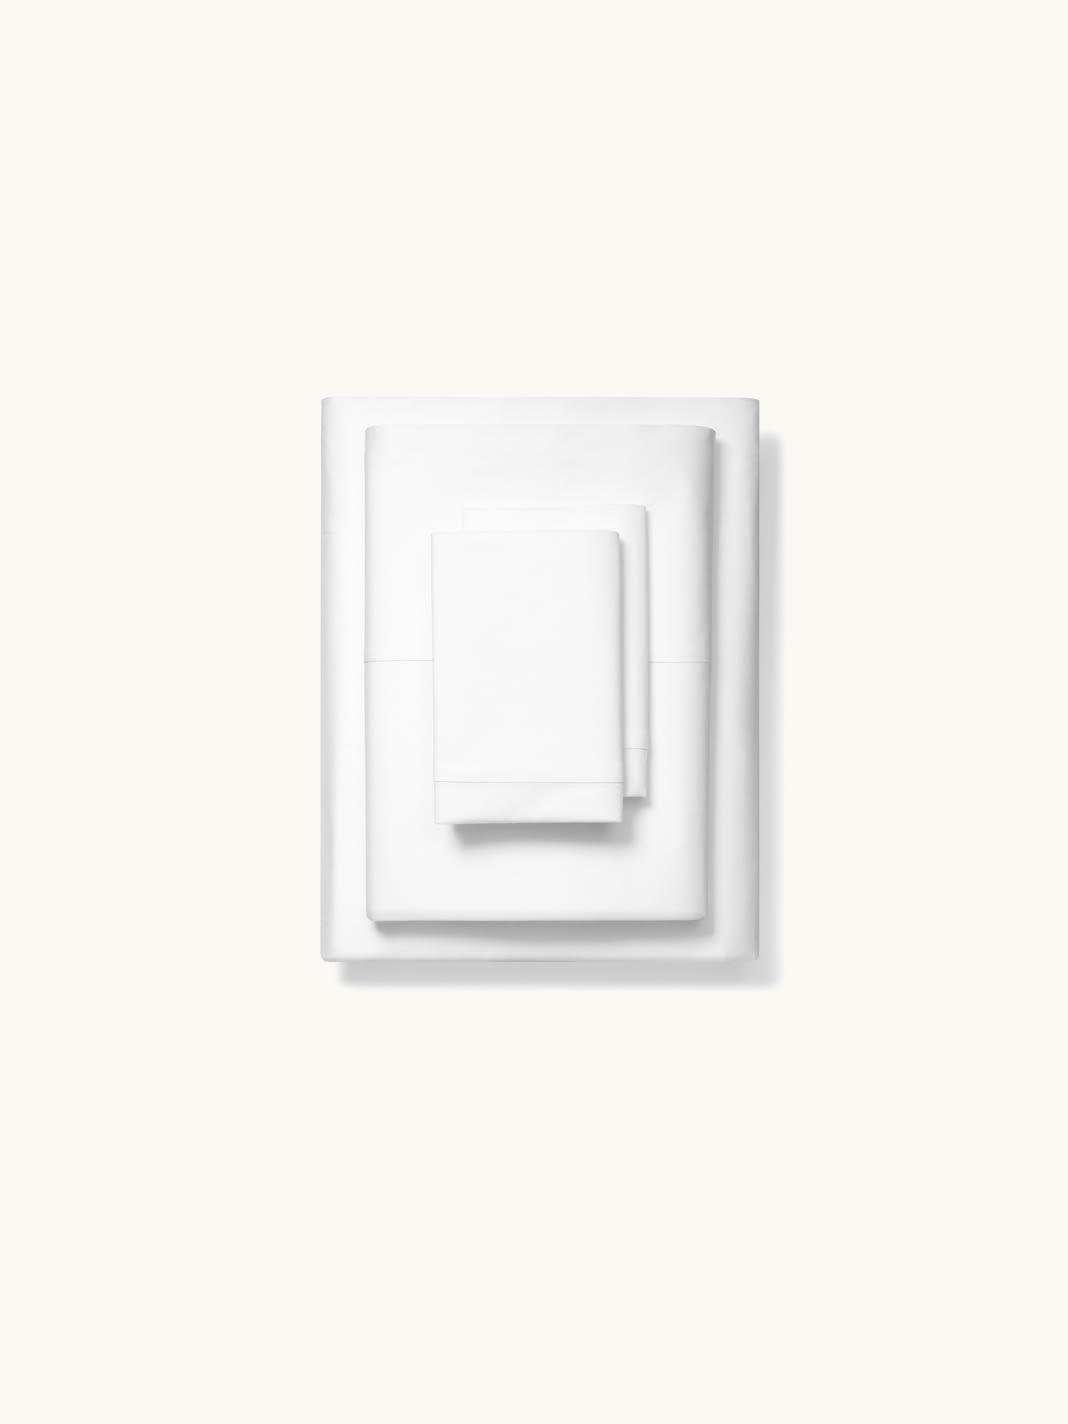 Percale Hemmed Sheet Set | Boll & Branch